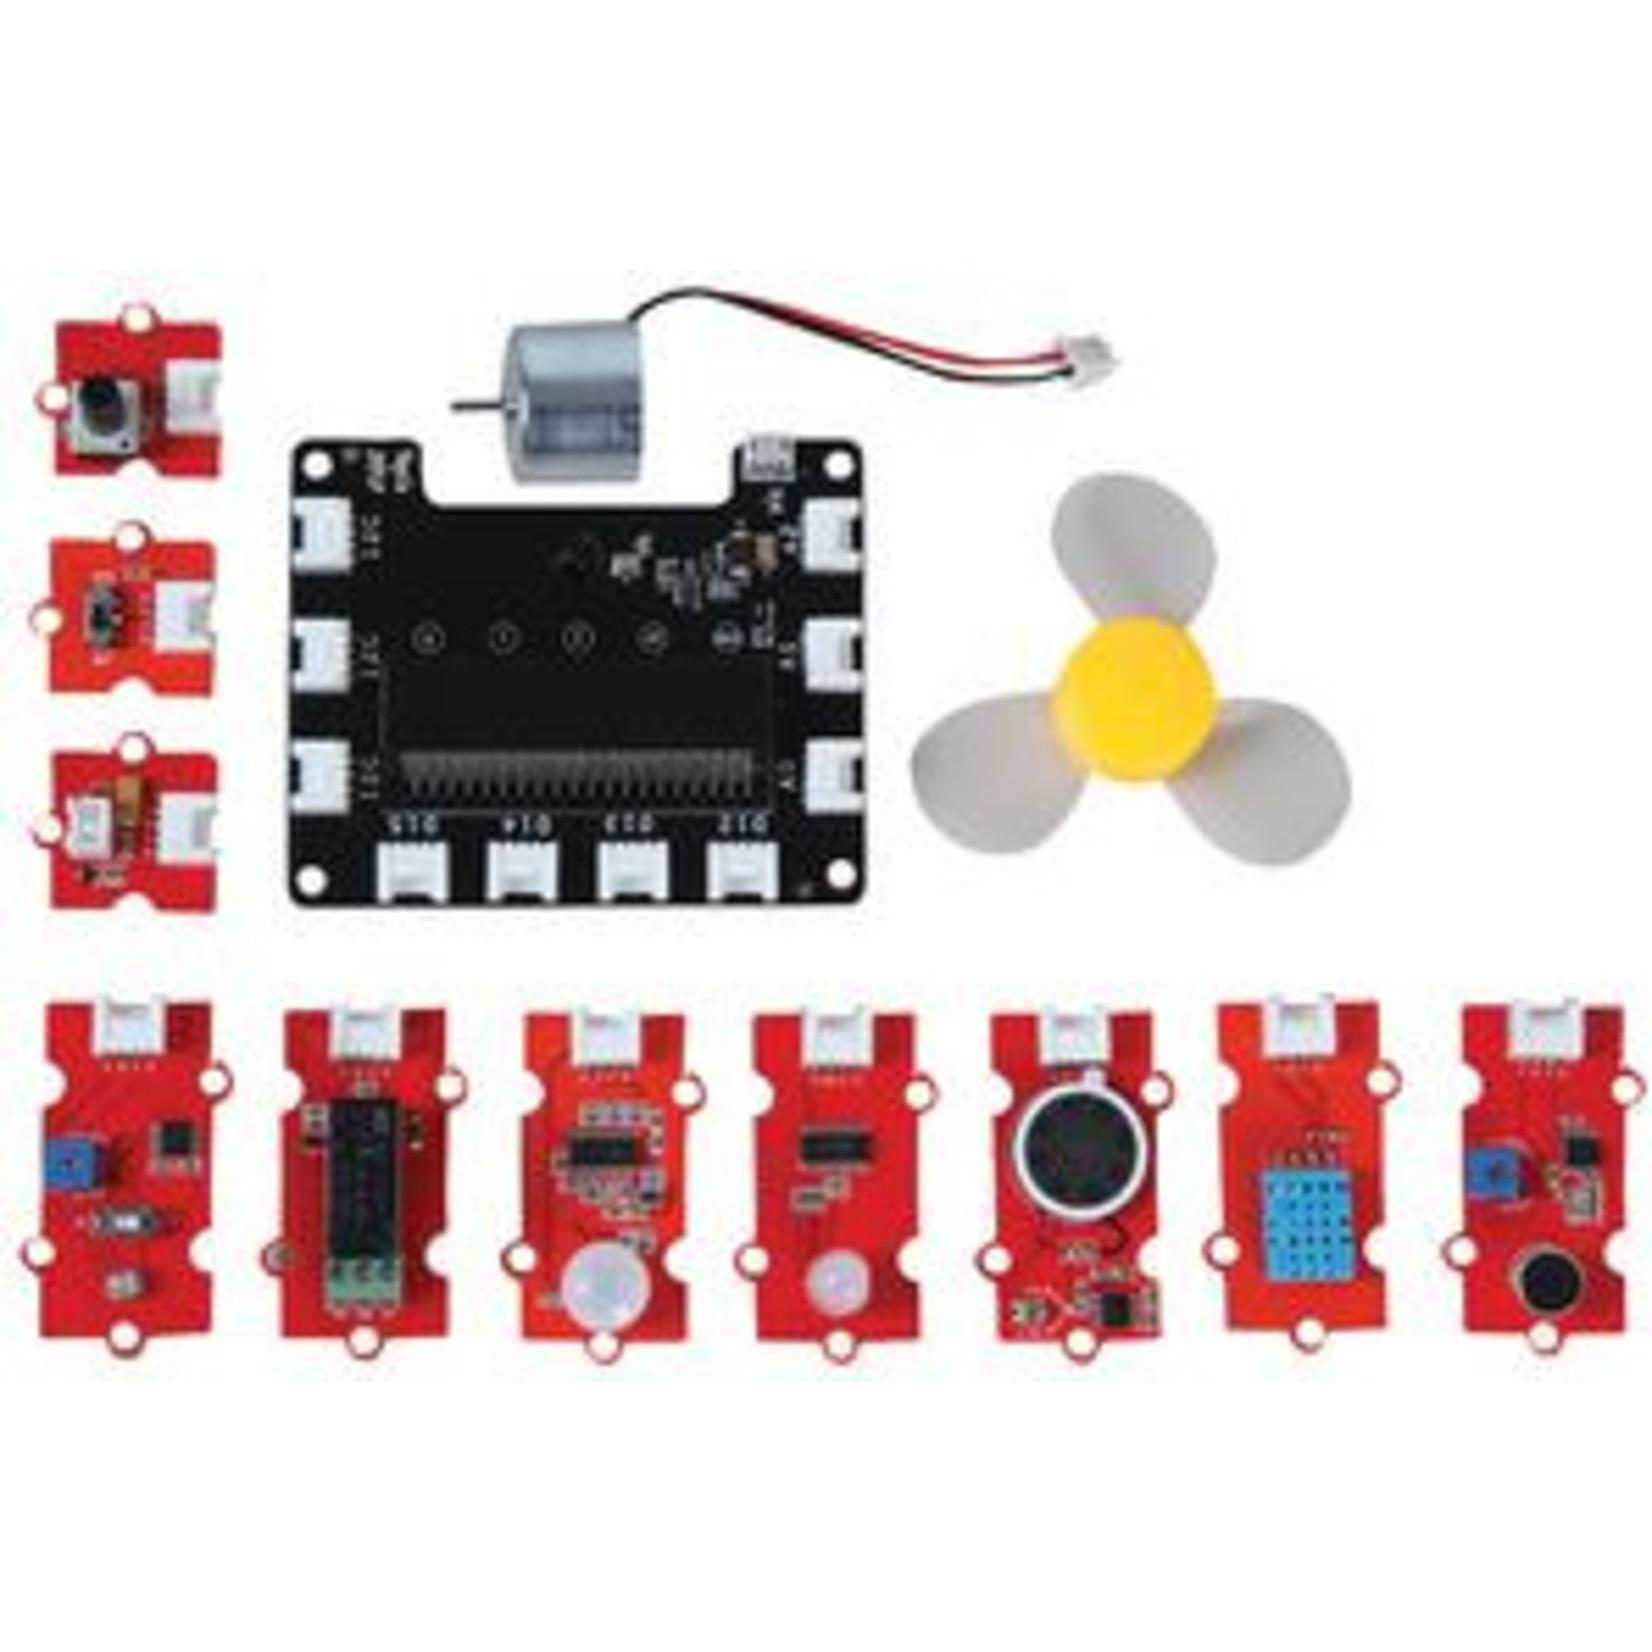 mi:node development Kit for micro:bit, 10 x Sensor Modules